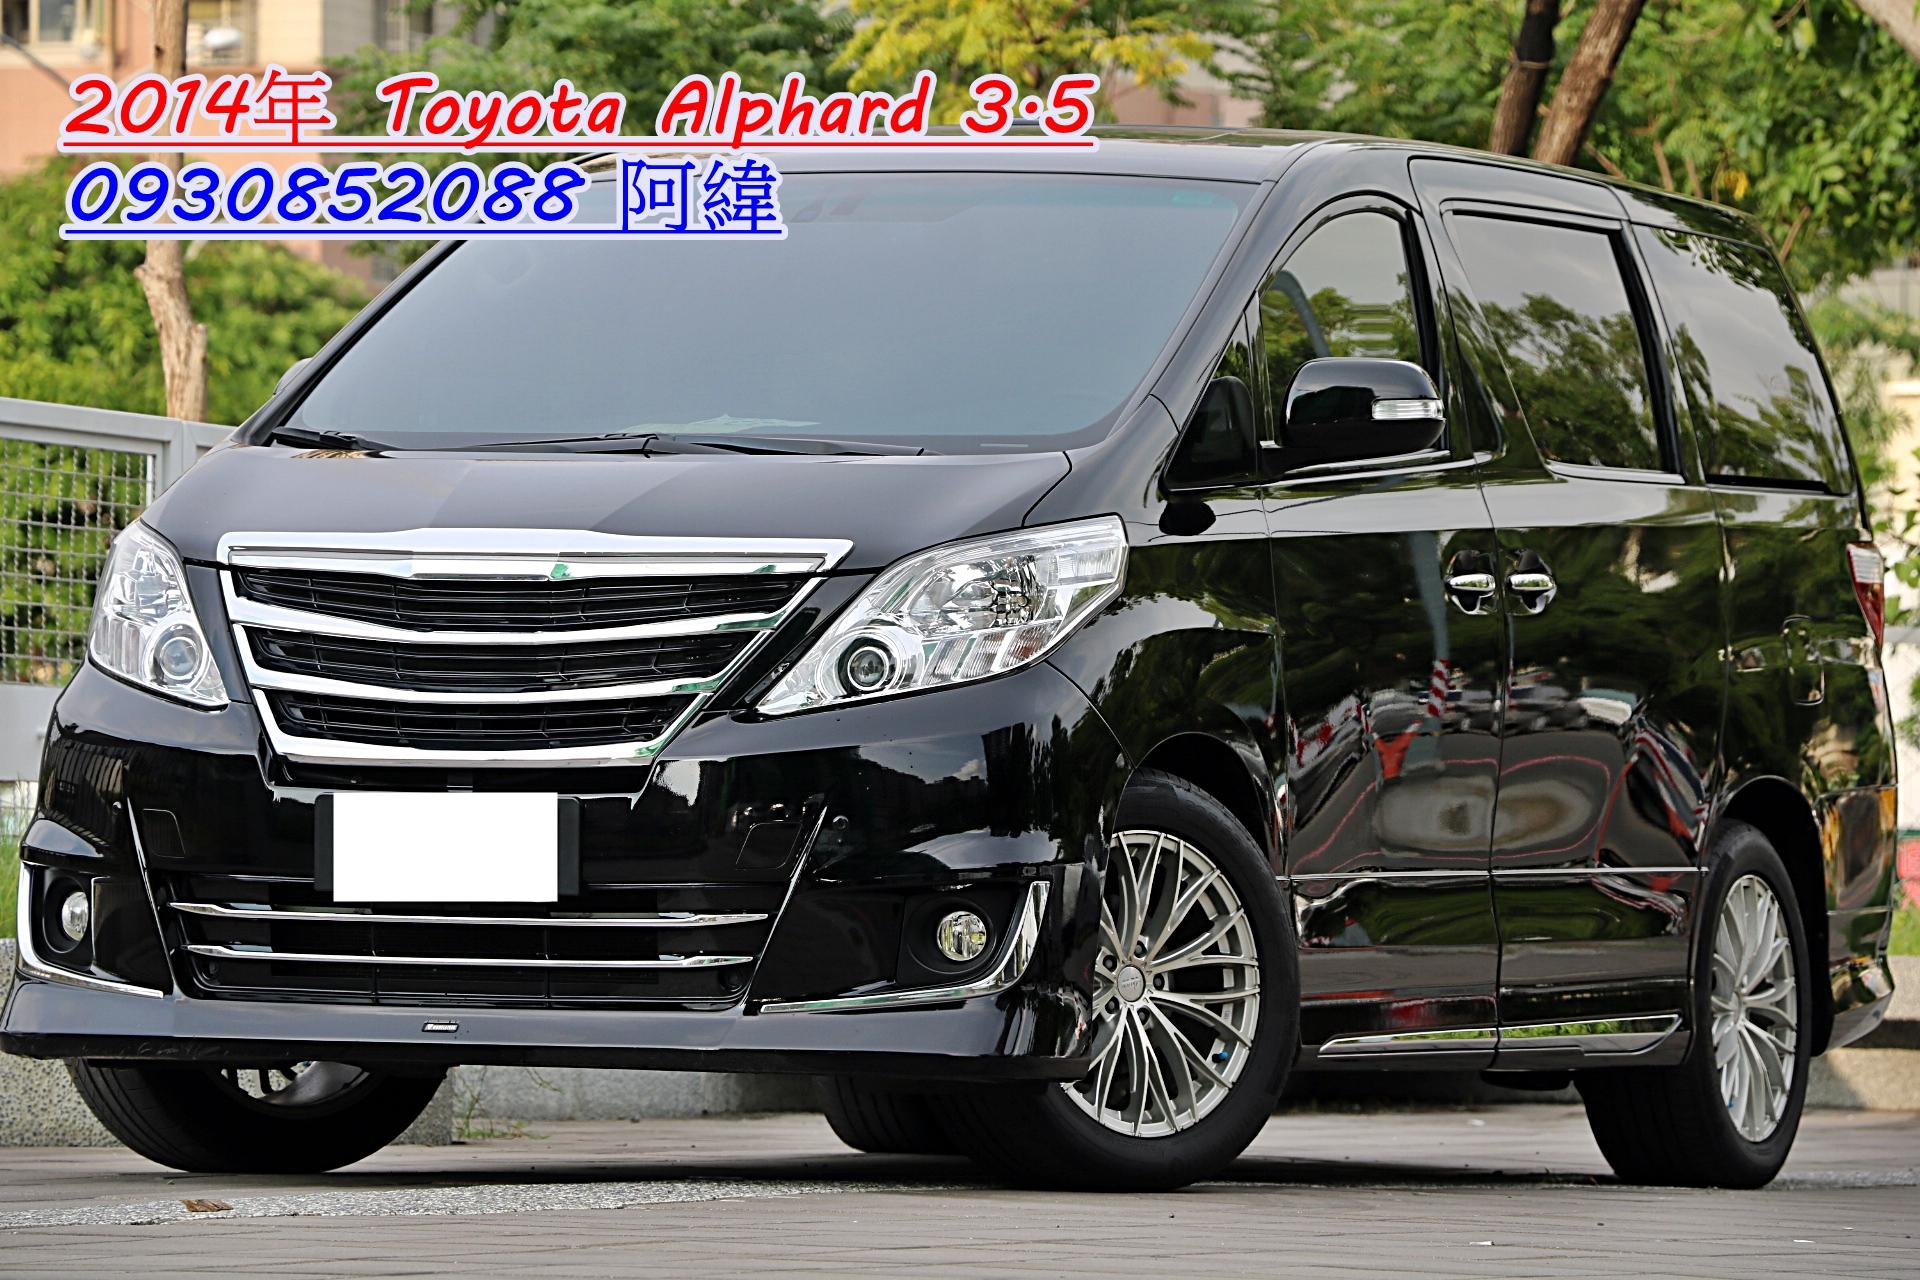 2014 Toyota Alphard